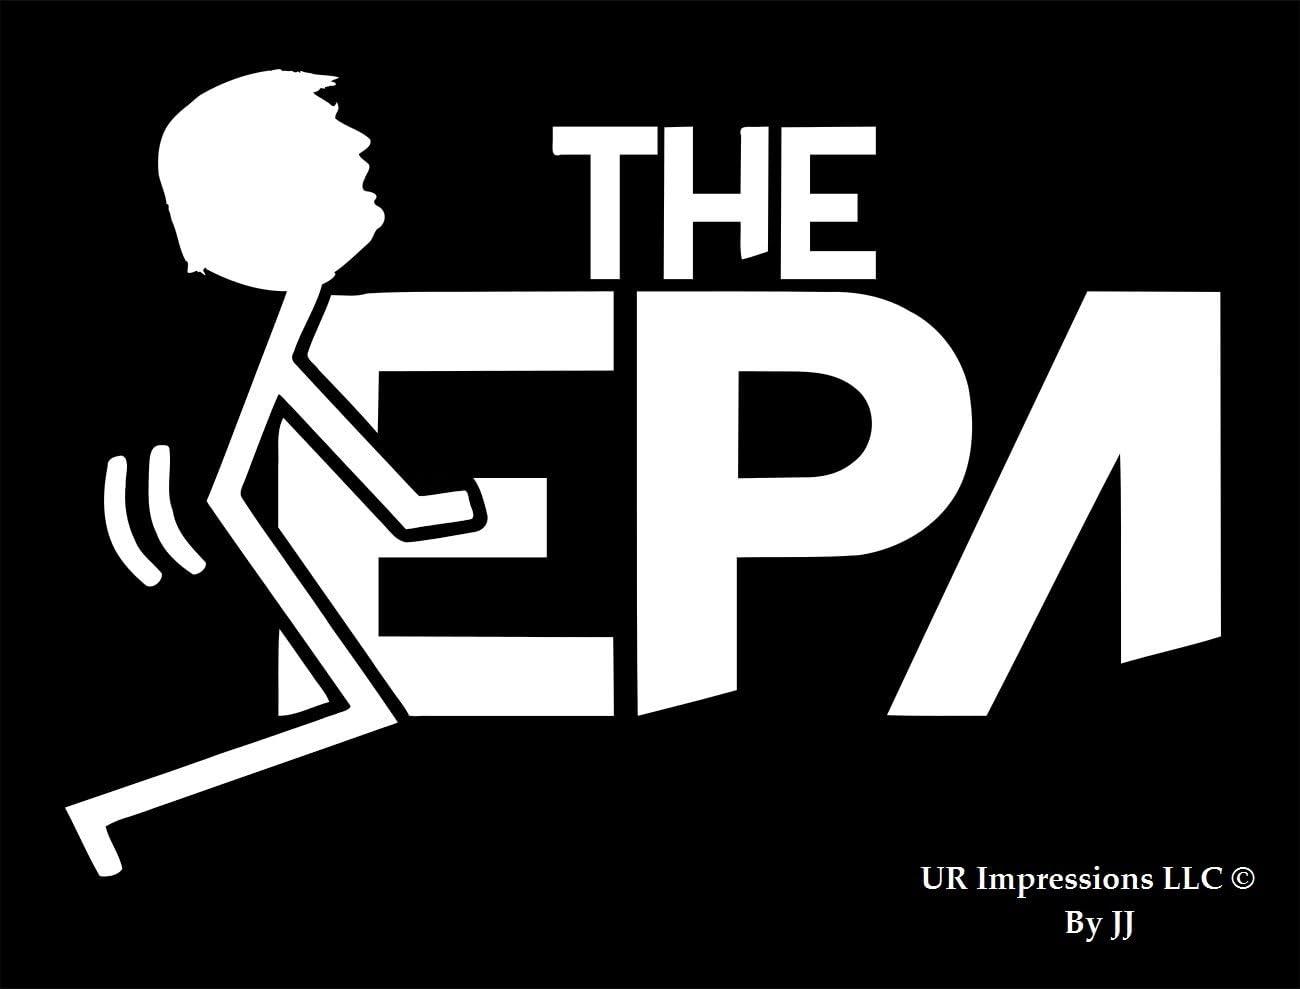 UR Impressions Stick Figure Trump F@ck The EPA Decal Vinyl Sticker Graphics for Cars Trucks SUV Vans Walls Windows Laptop Tablet|White|6.3 X 4.4 inch|JJURI090